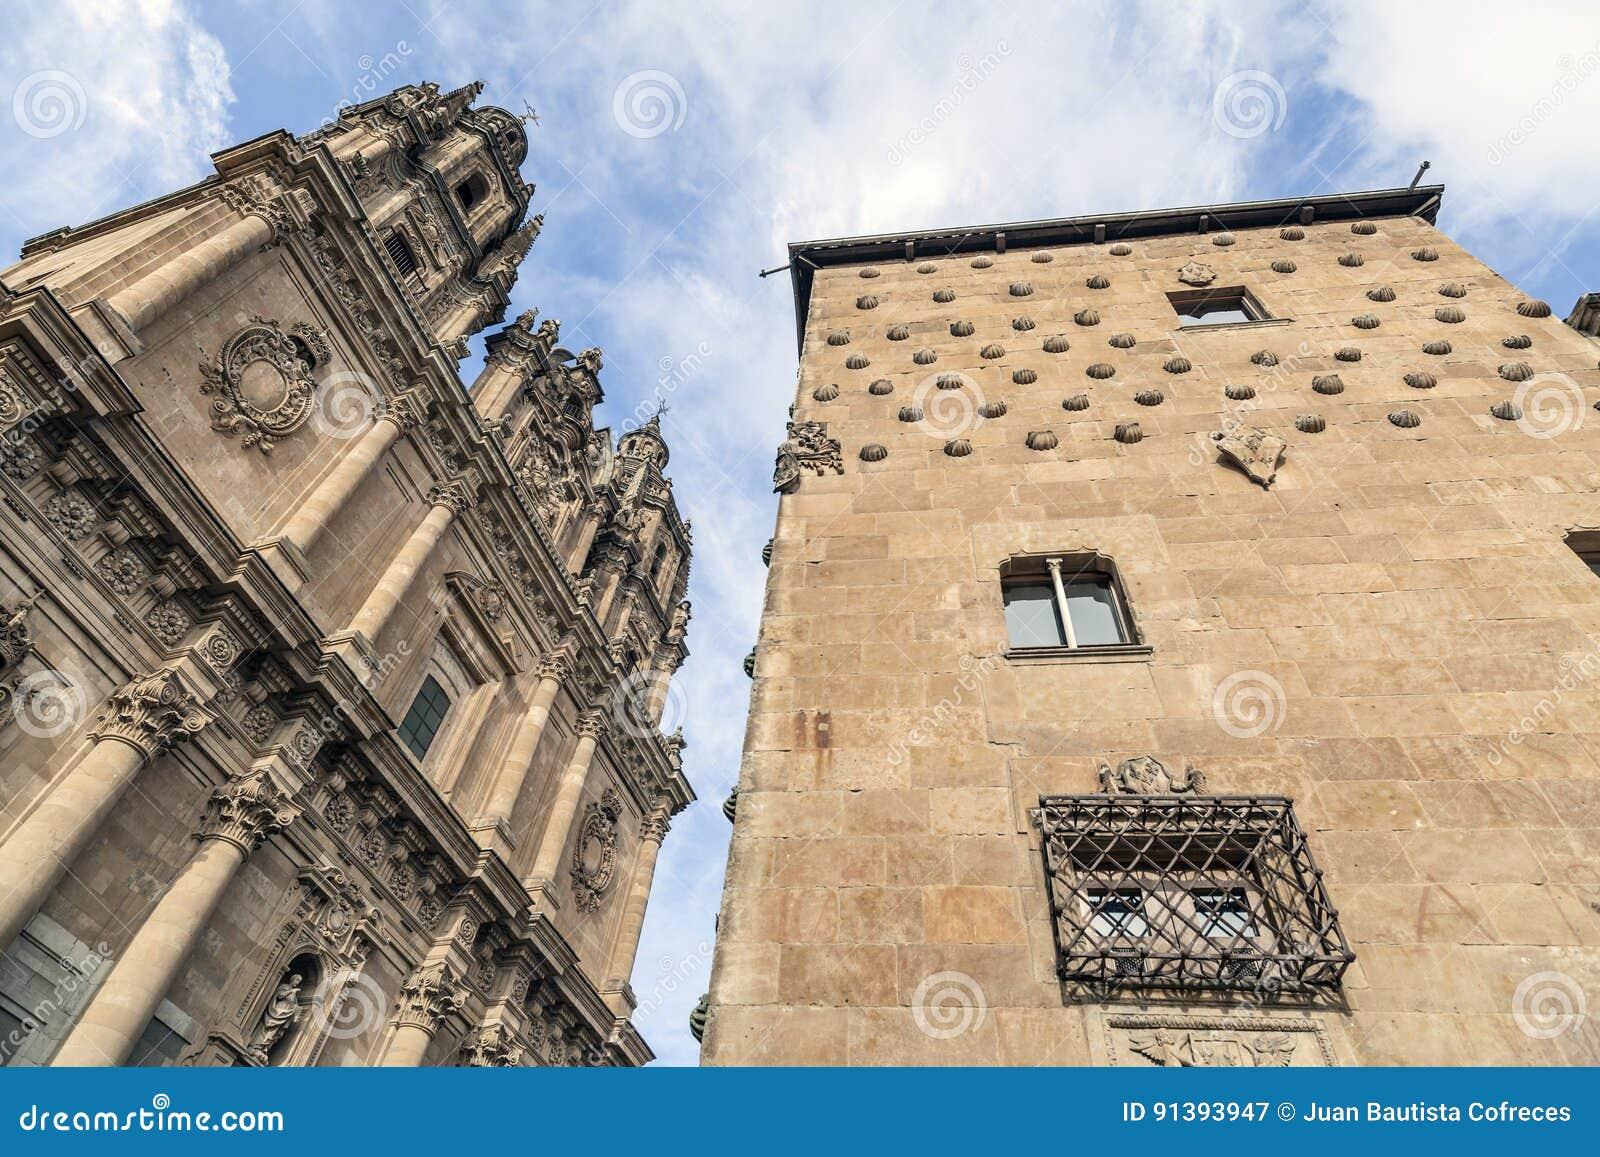 Salamanca,Castilla Leon,Spain.